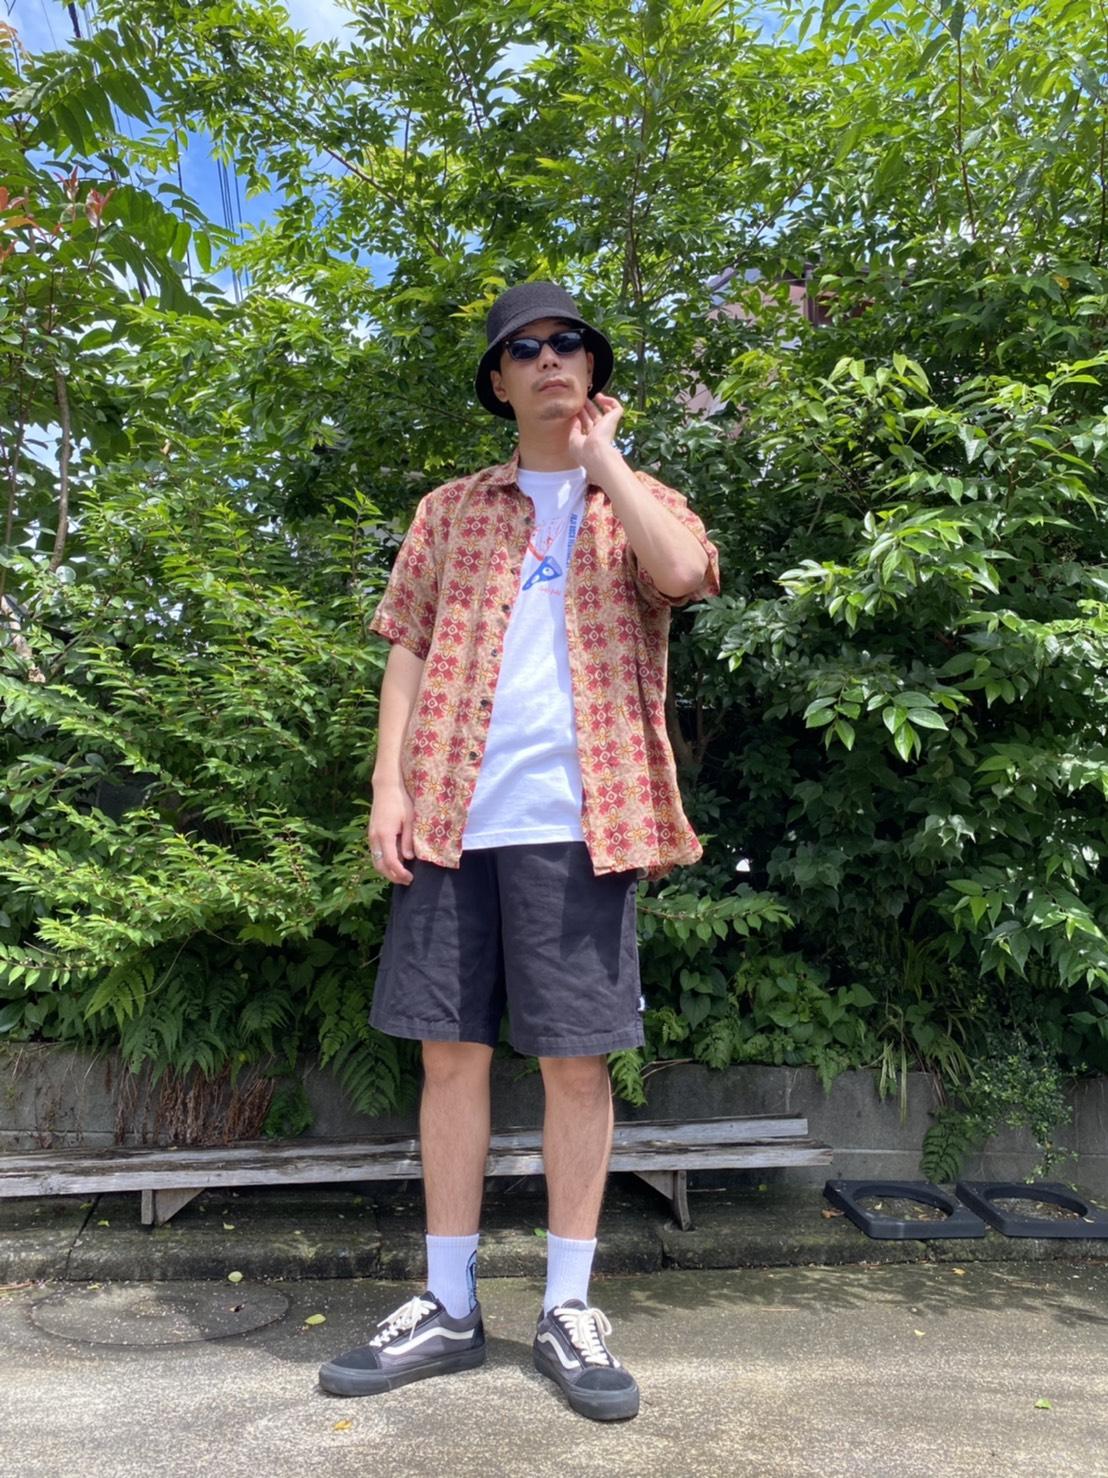 0616_news_fujirock-2021-good03_30 【ファッションスナップ】フジロック'21に行くならば 期間限定フジロックTシャツ特集 #fujirock